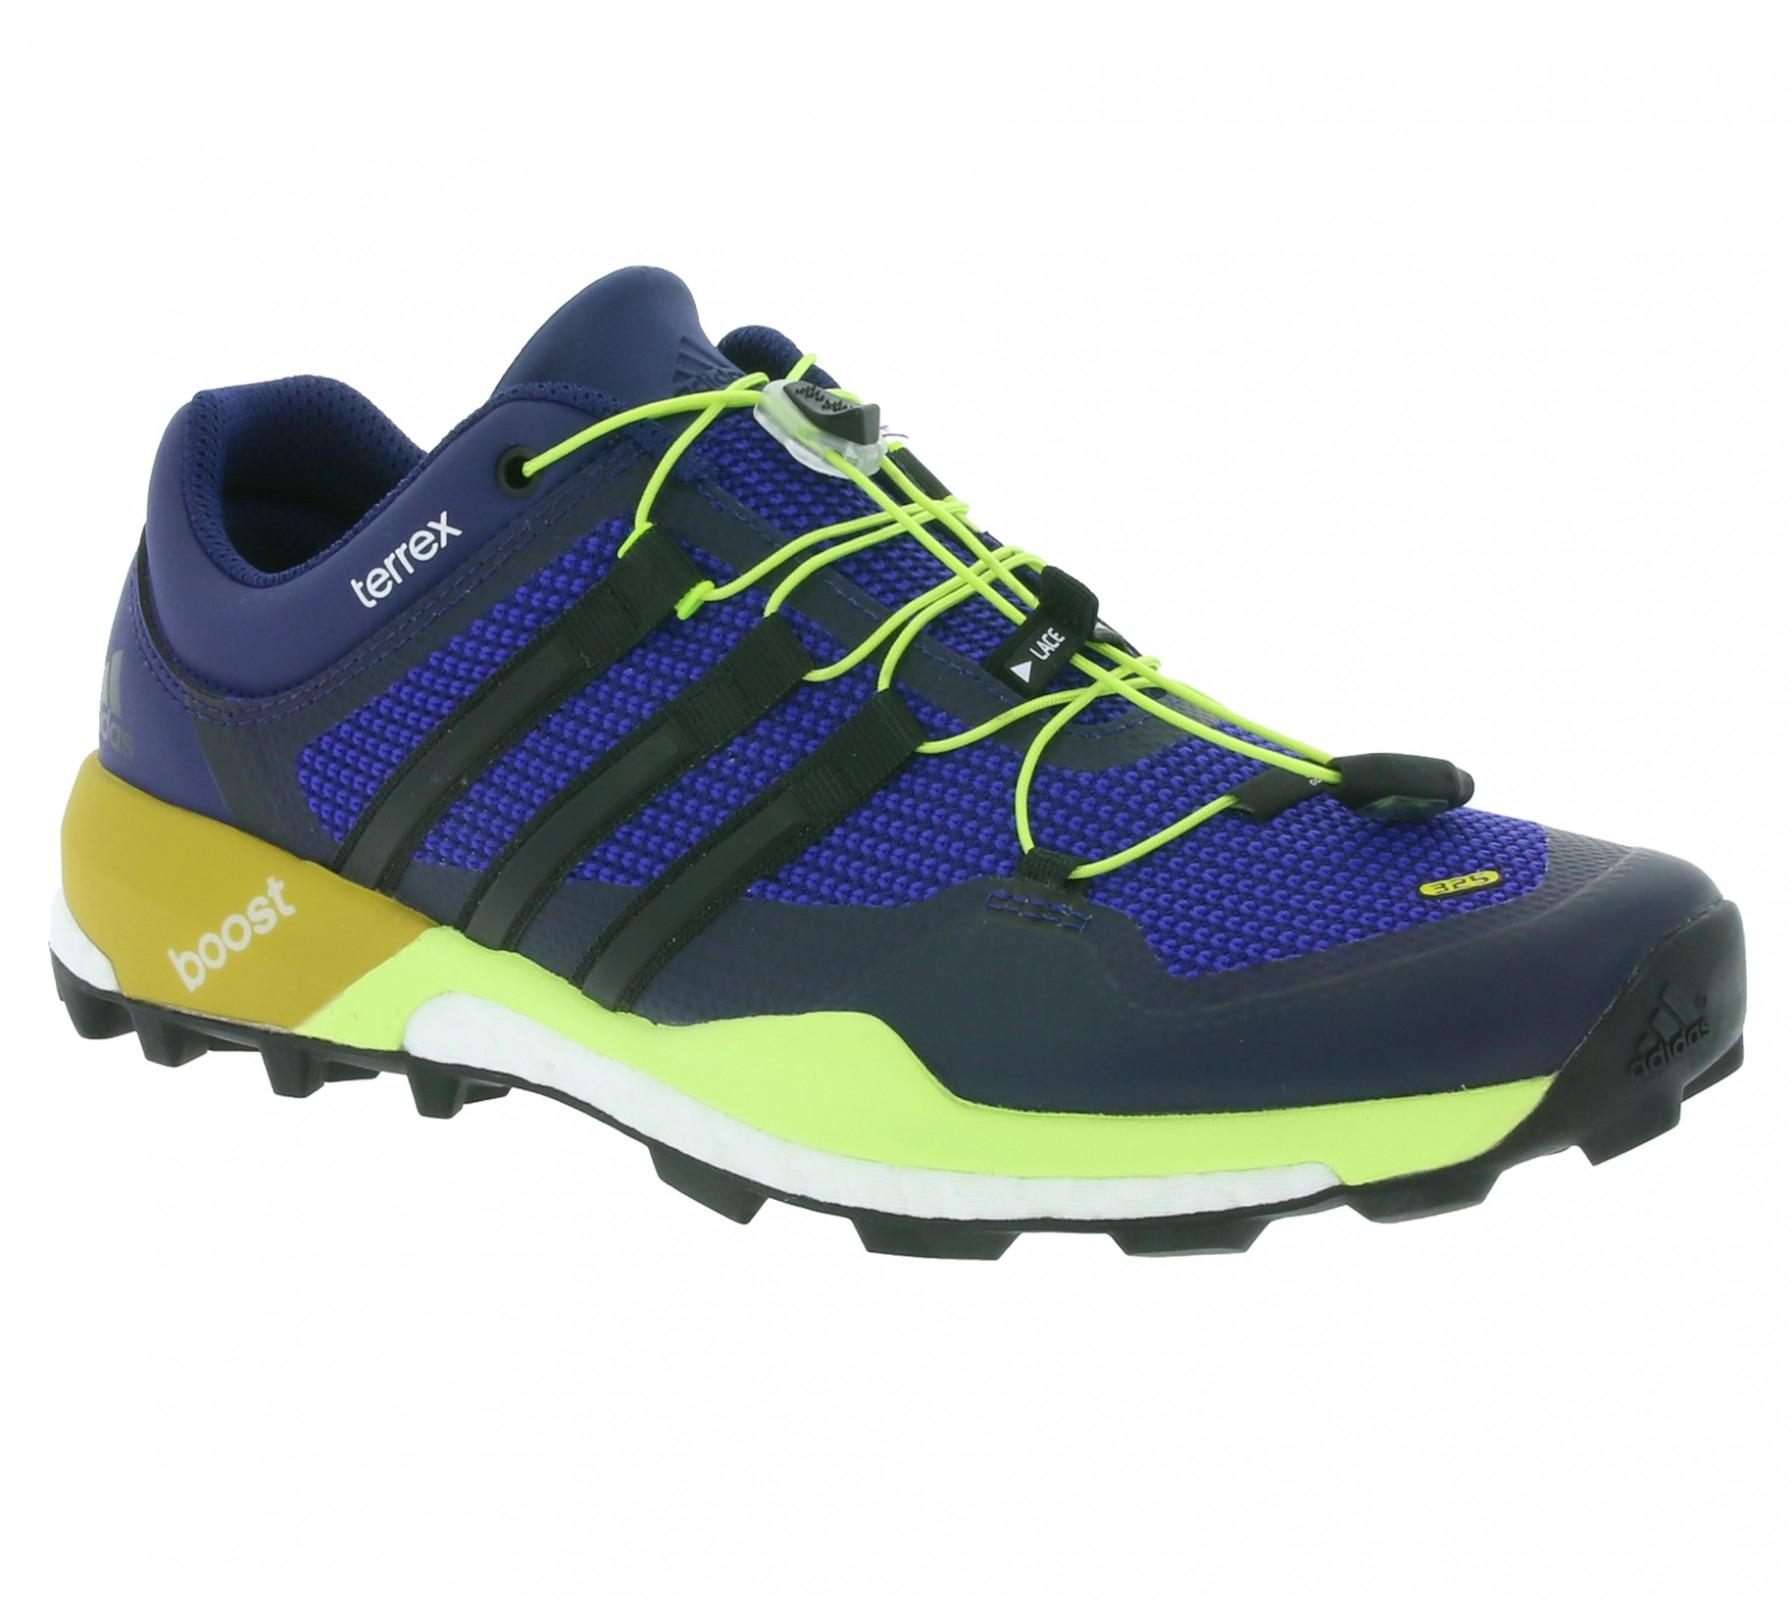 OUTLET46: adidas Terrex Boost Herren Outdoor Trailrunning Schuhe, 49.99 (Normalpreis 89.- bis 160.-)